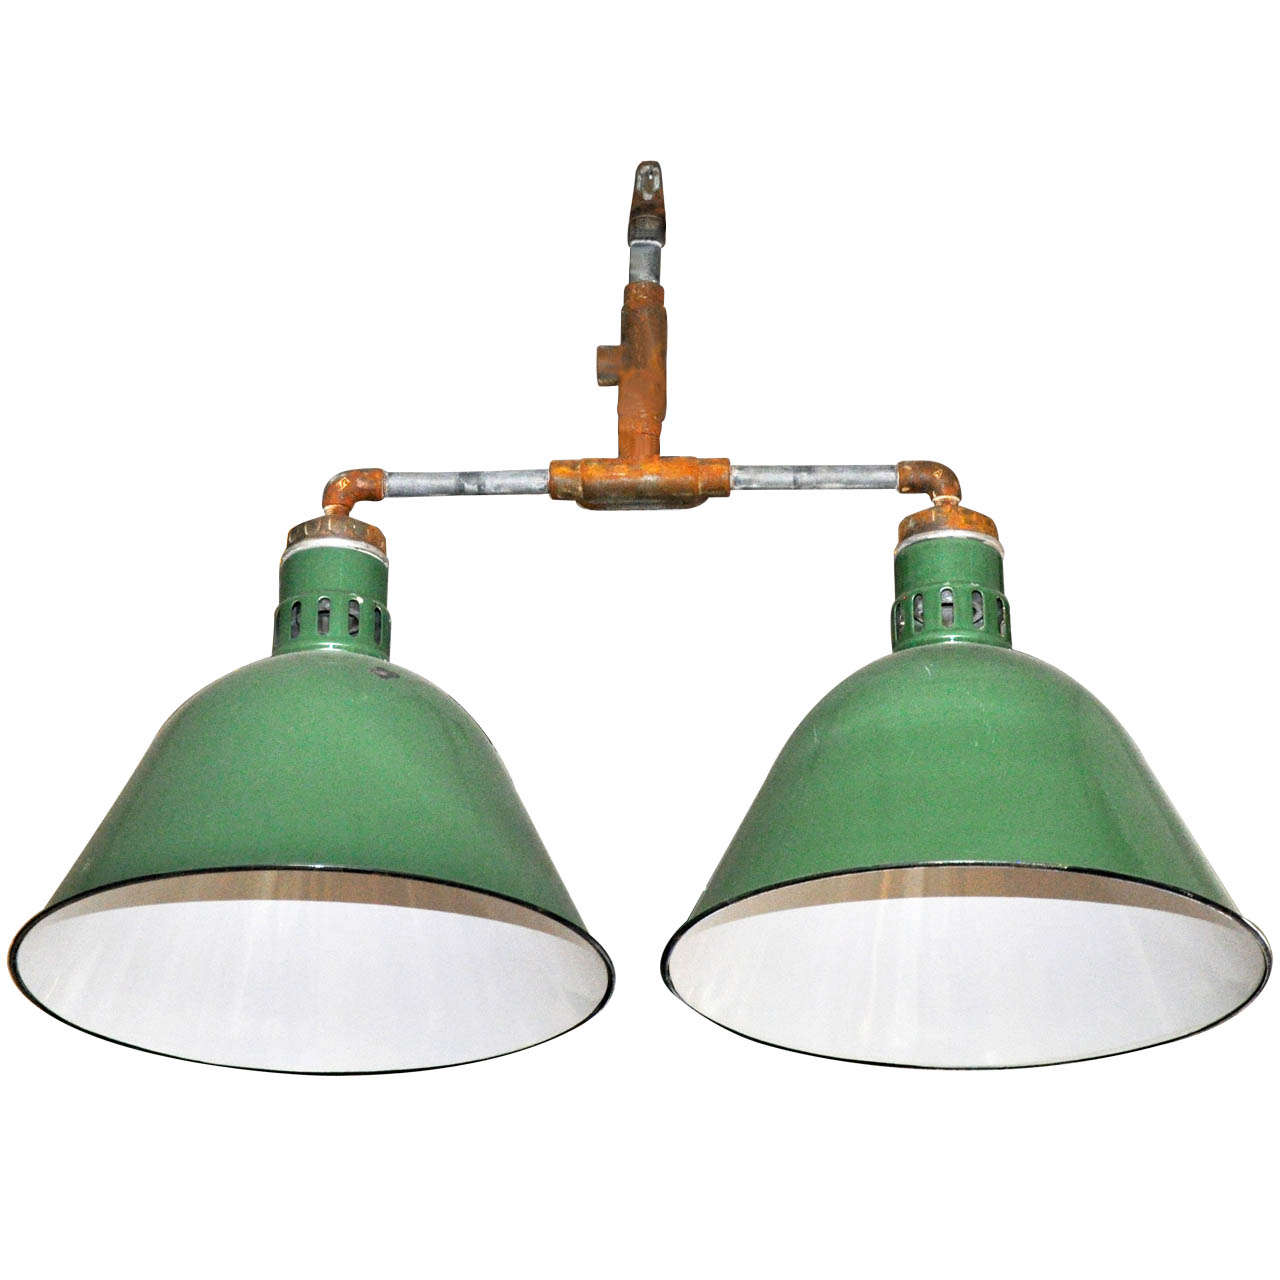 Double Pendant Industrial Light Fixture For Sale